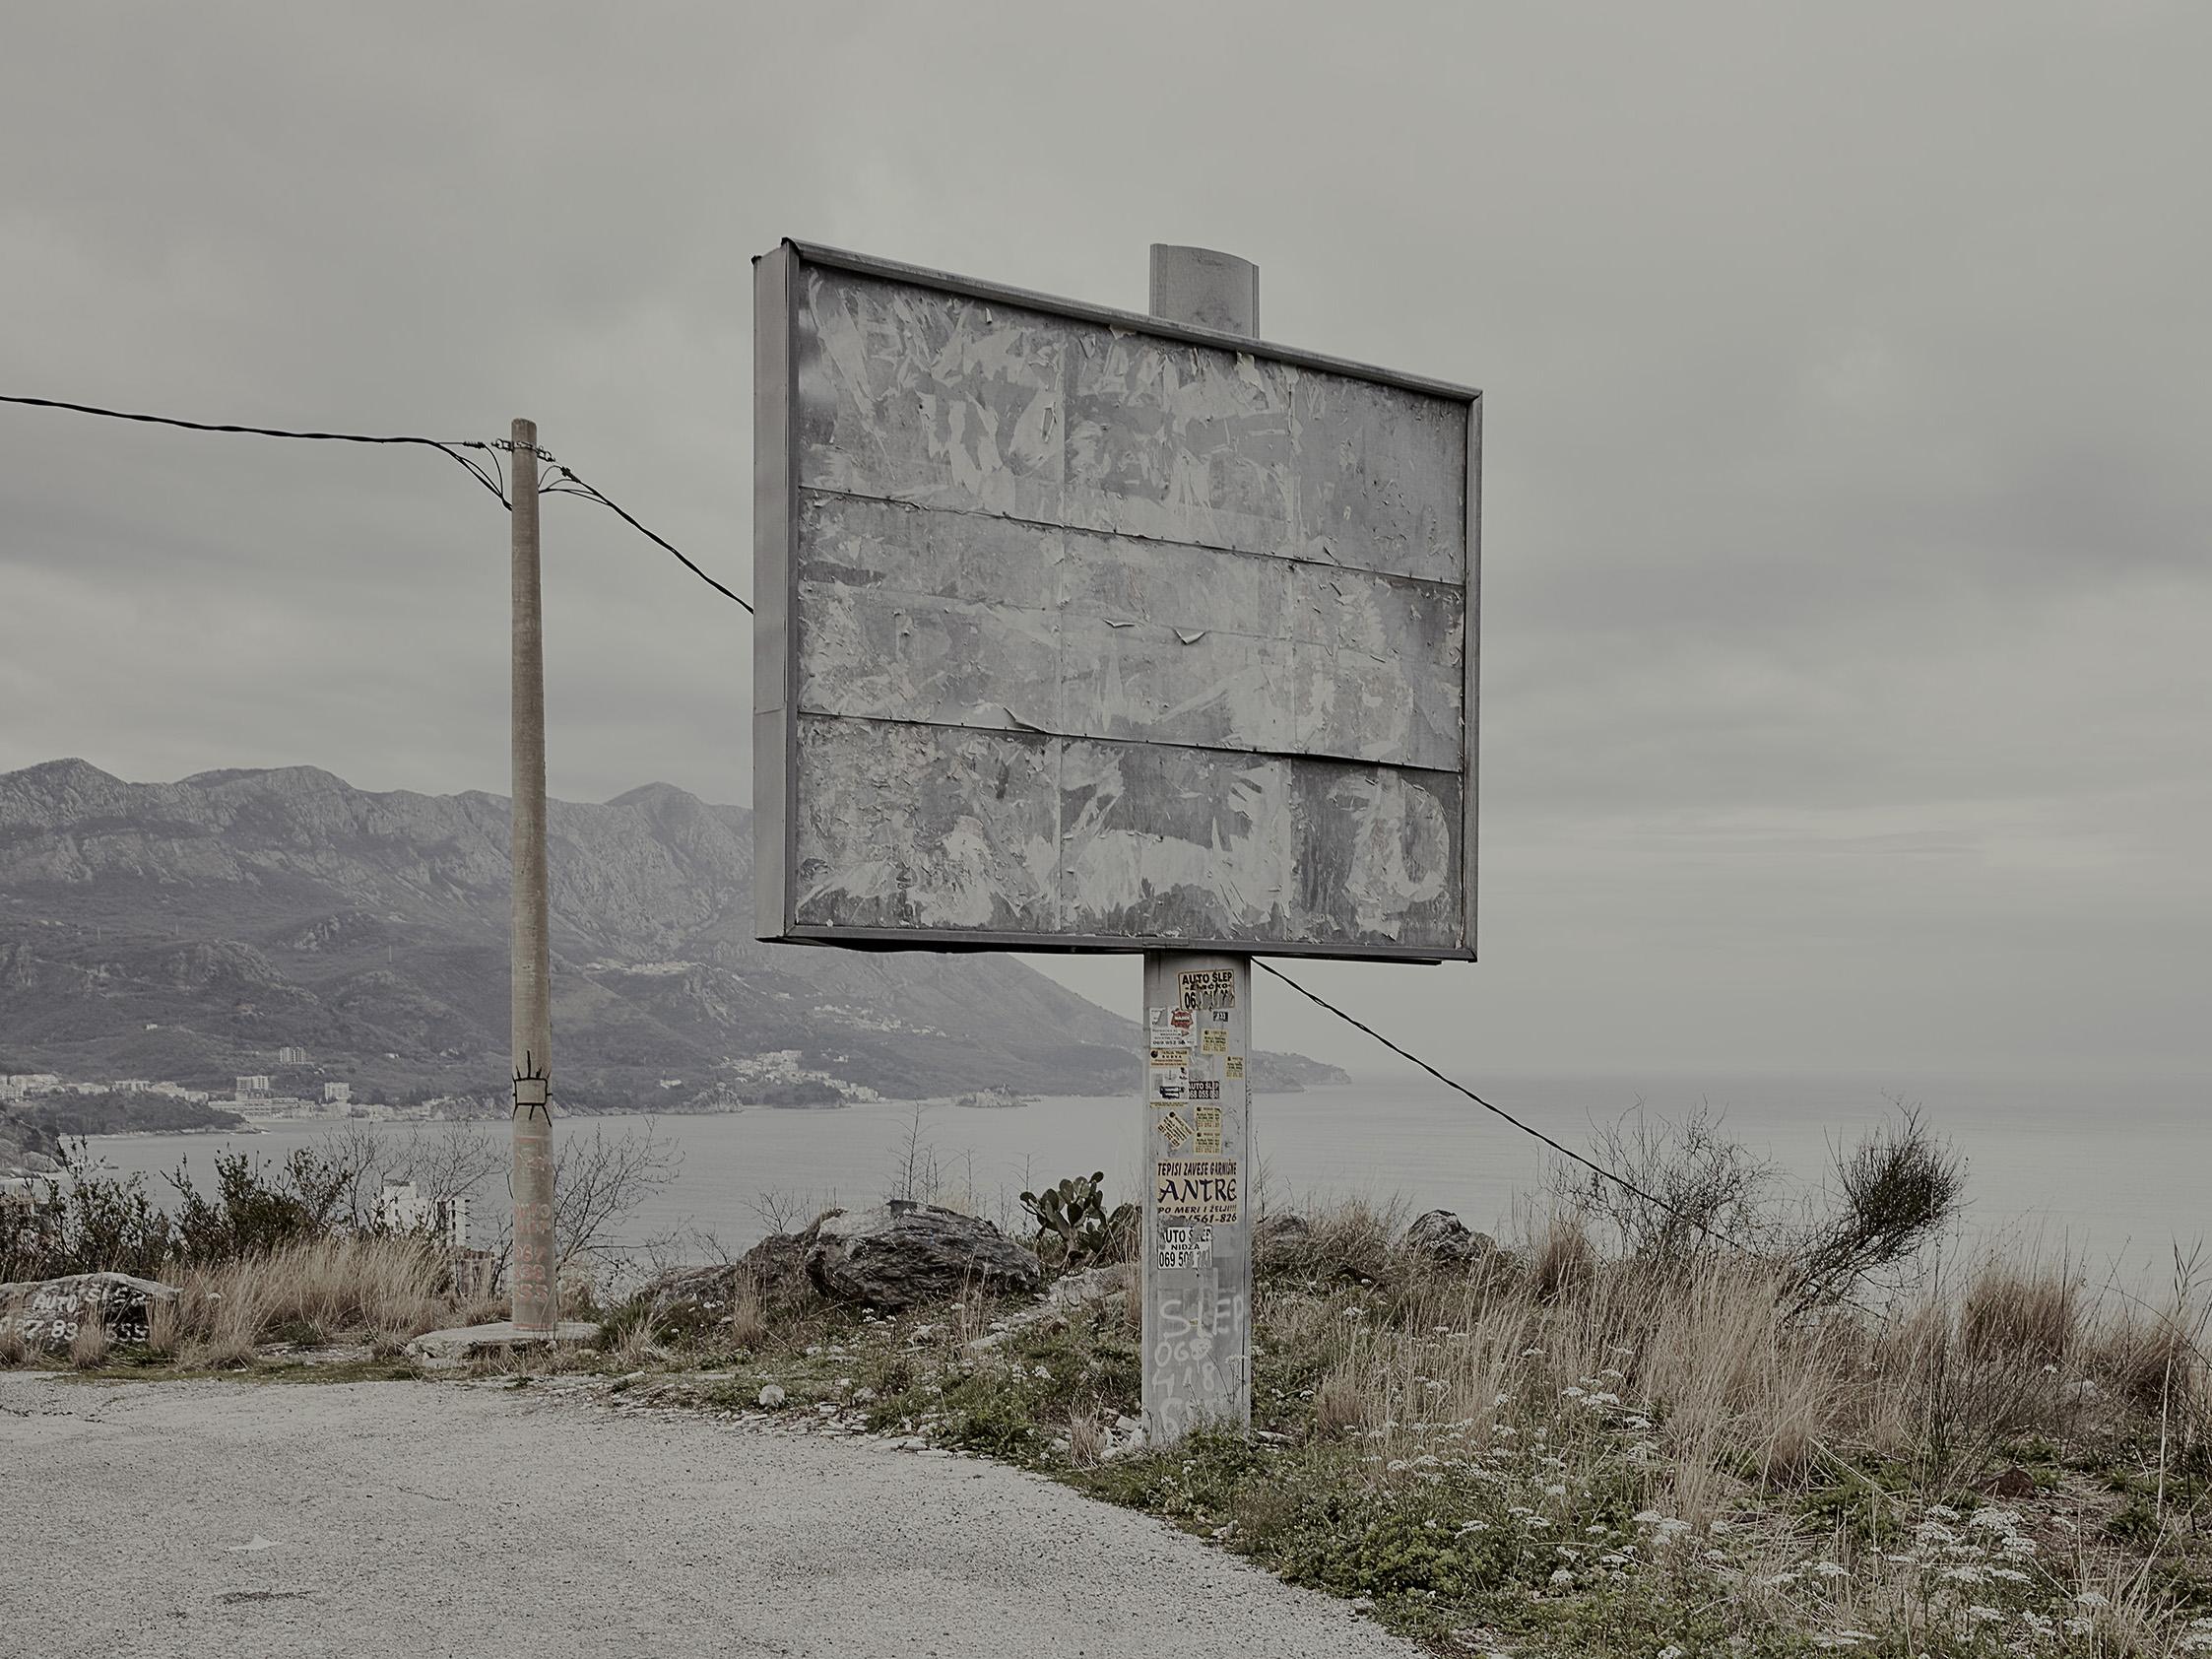 Patrick_Schuttler_Landscape_018.jpg